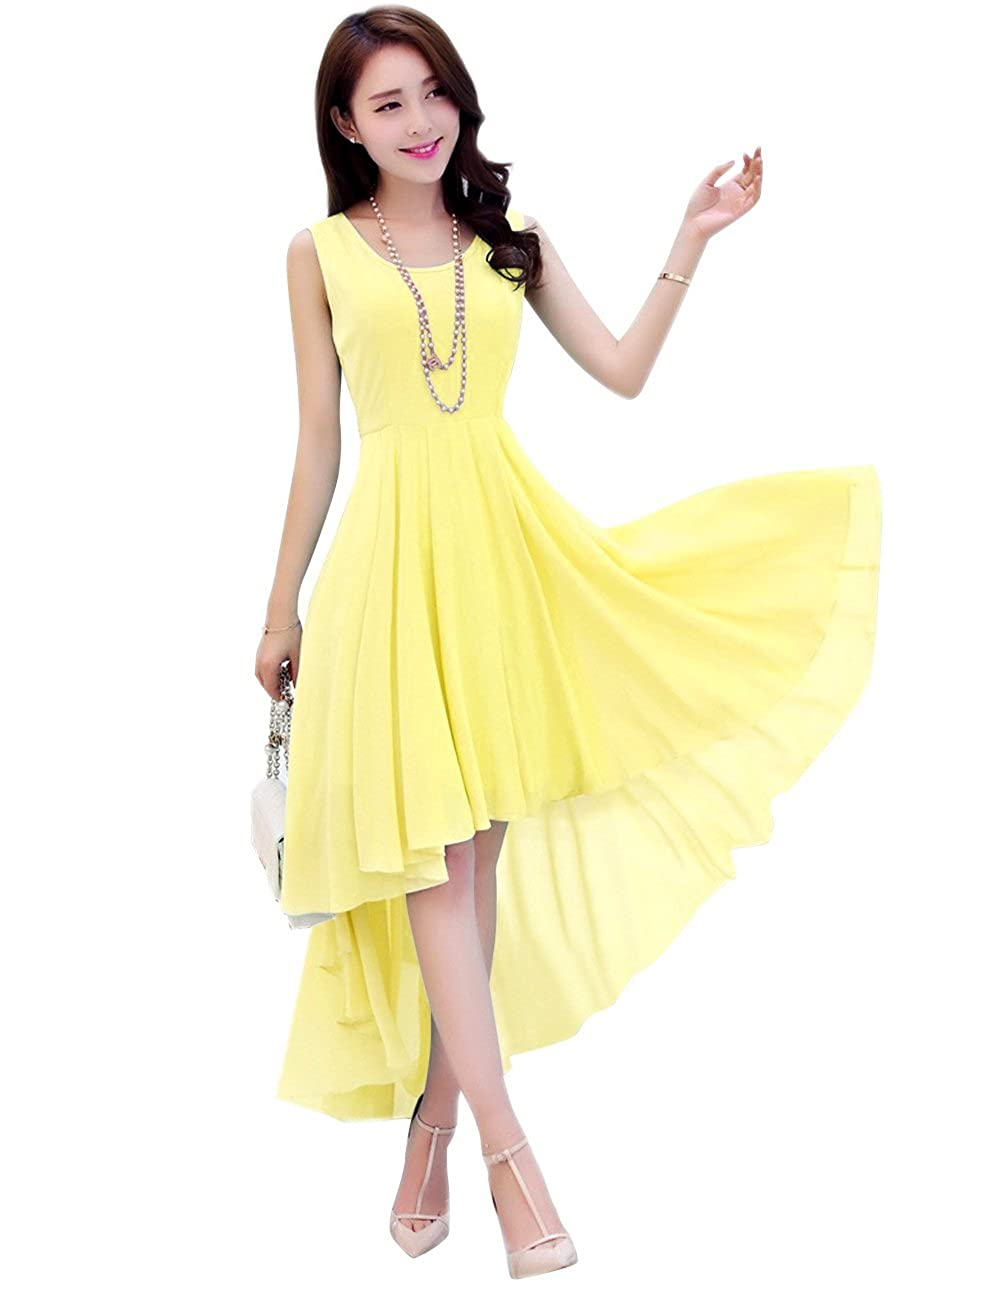 Daffodil Dasior Women's ALine Asymmetric High Low Summer Beach Holiday Party Dress